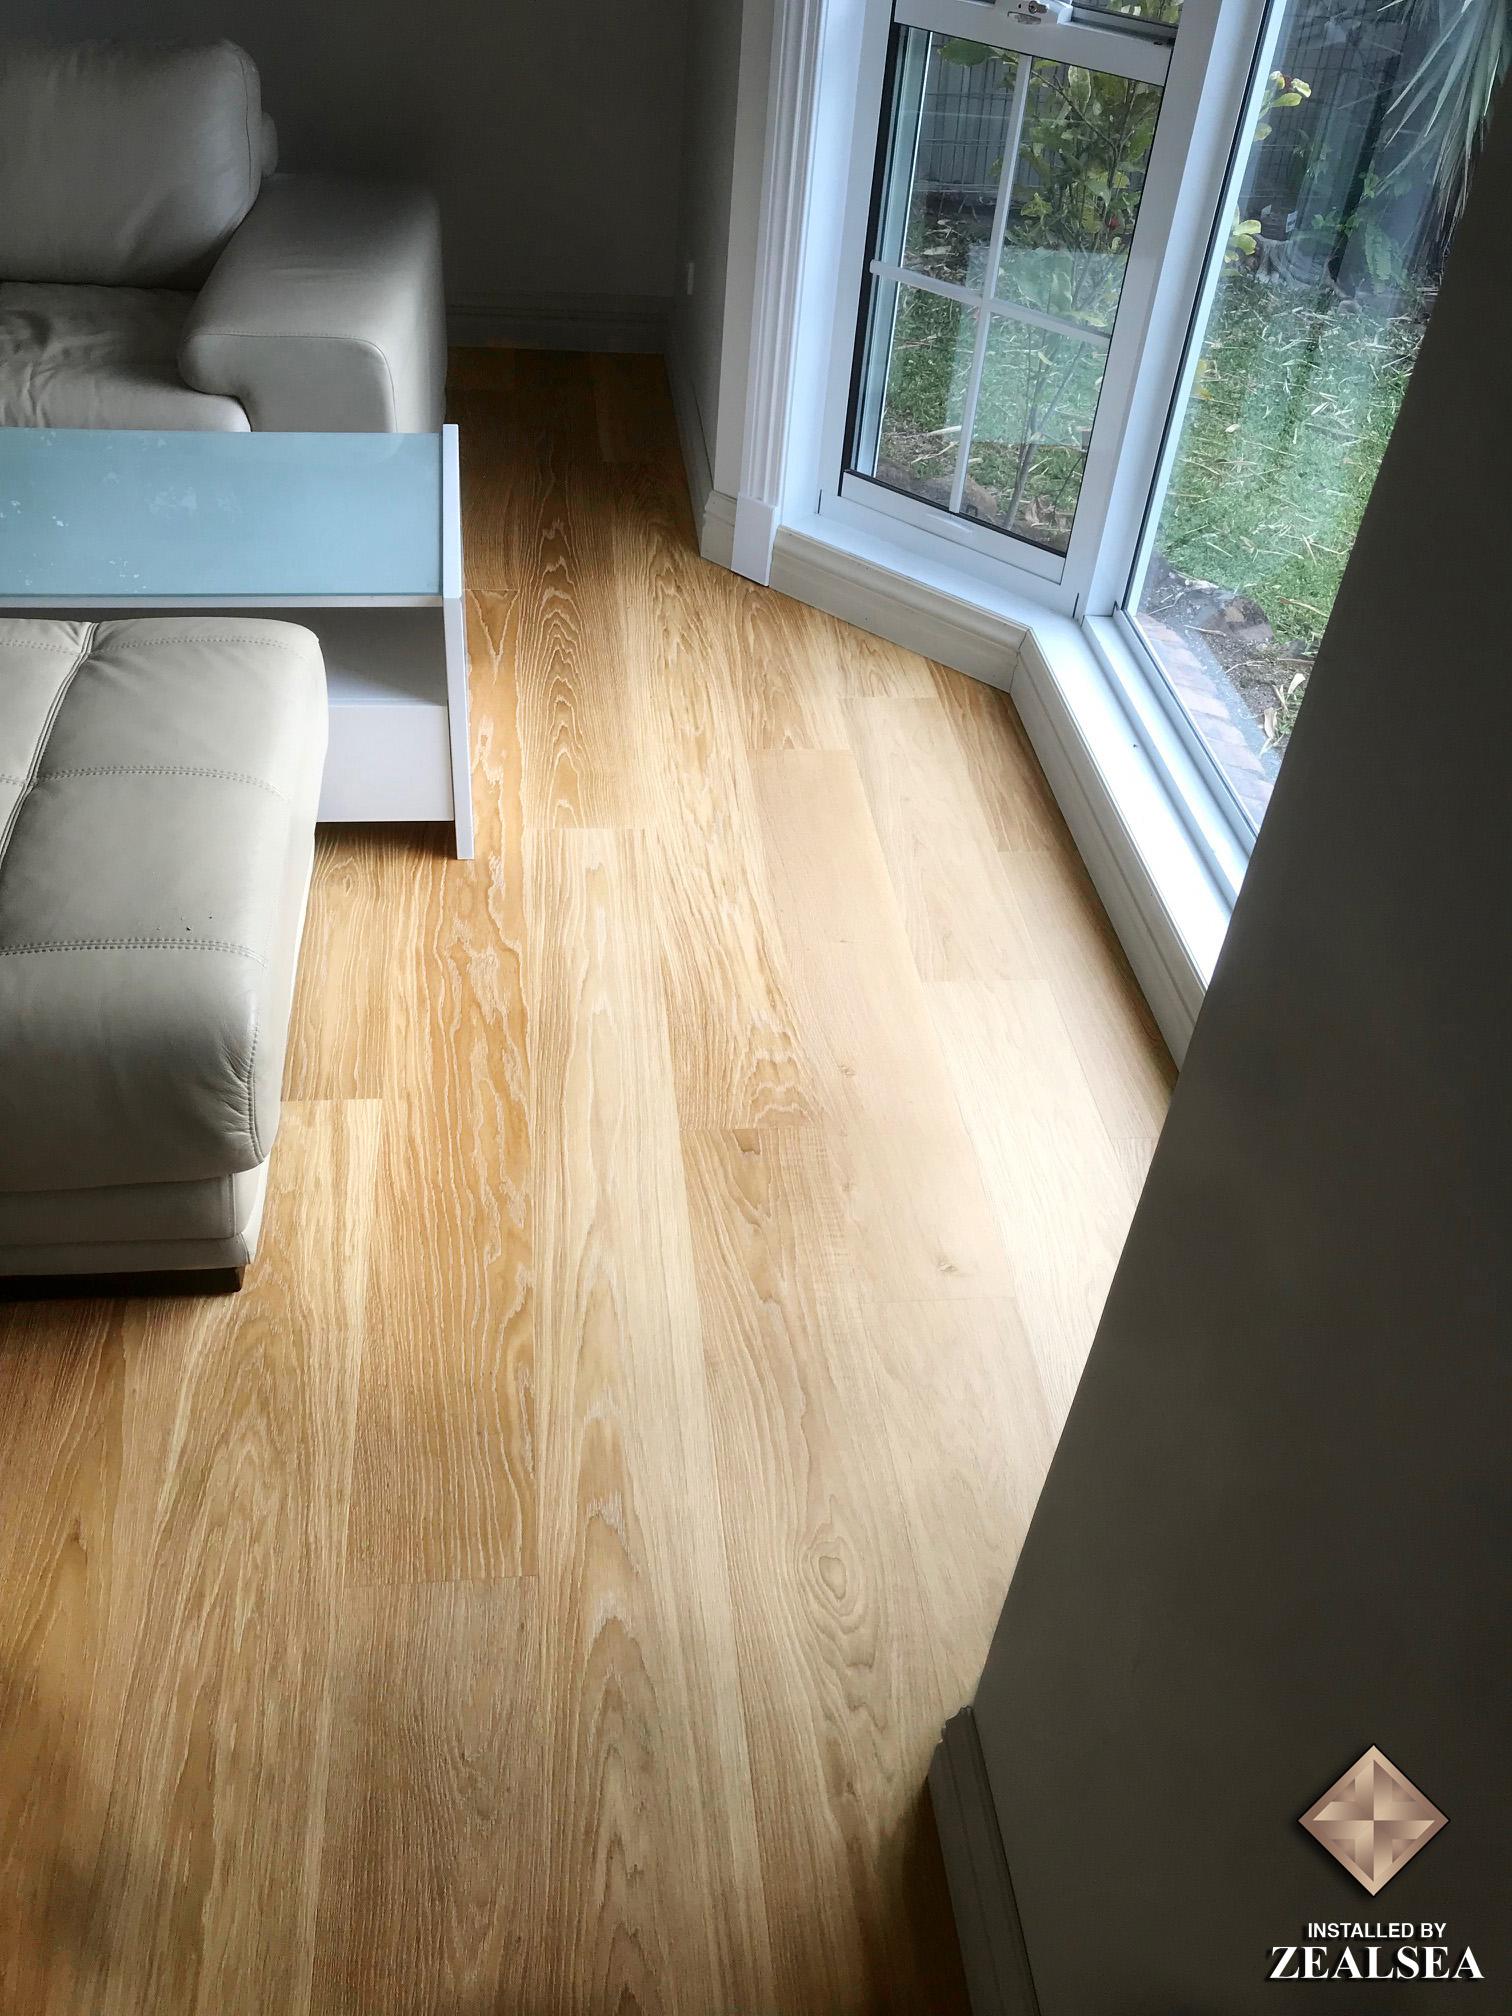 zealsea timber flooring professional installation robina coswick antique white 3